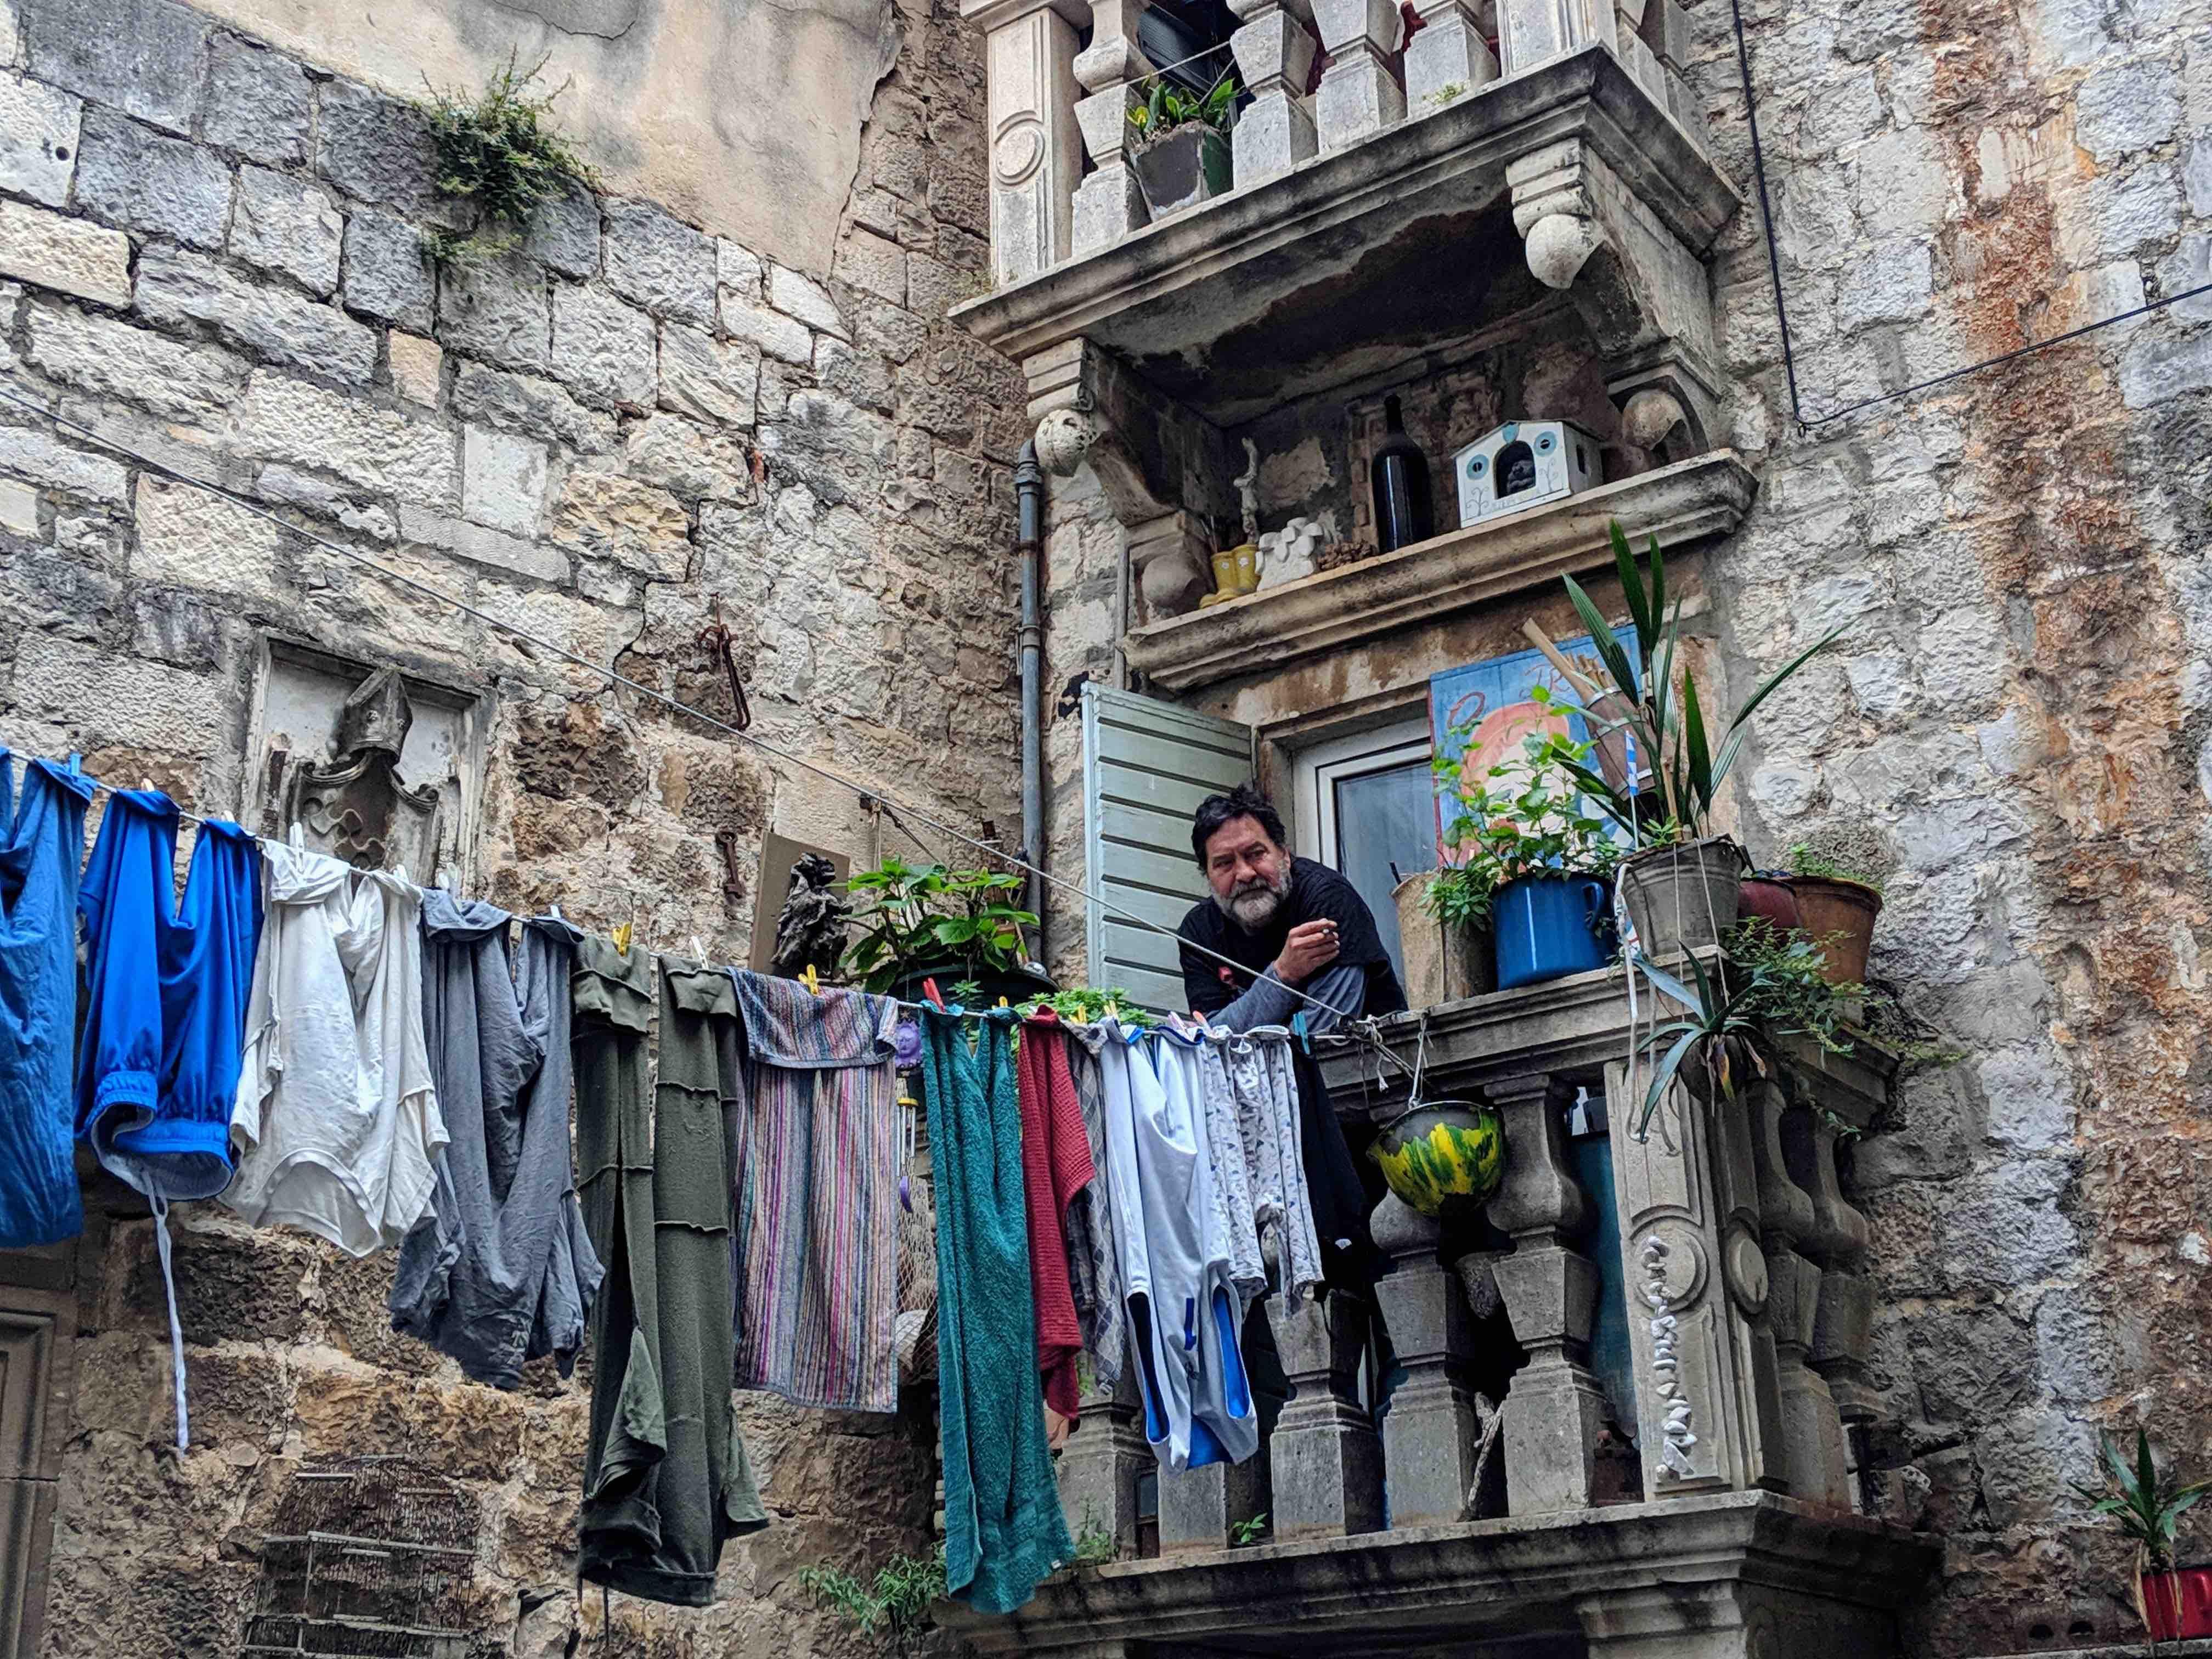 Artist in Trogir